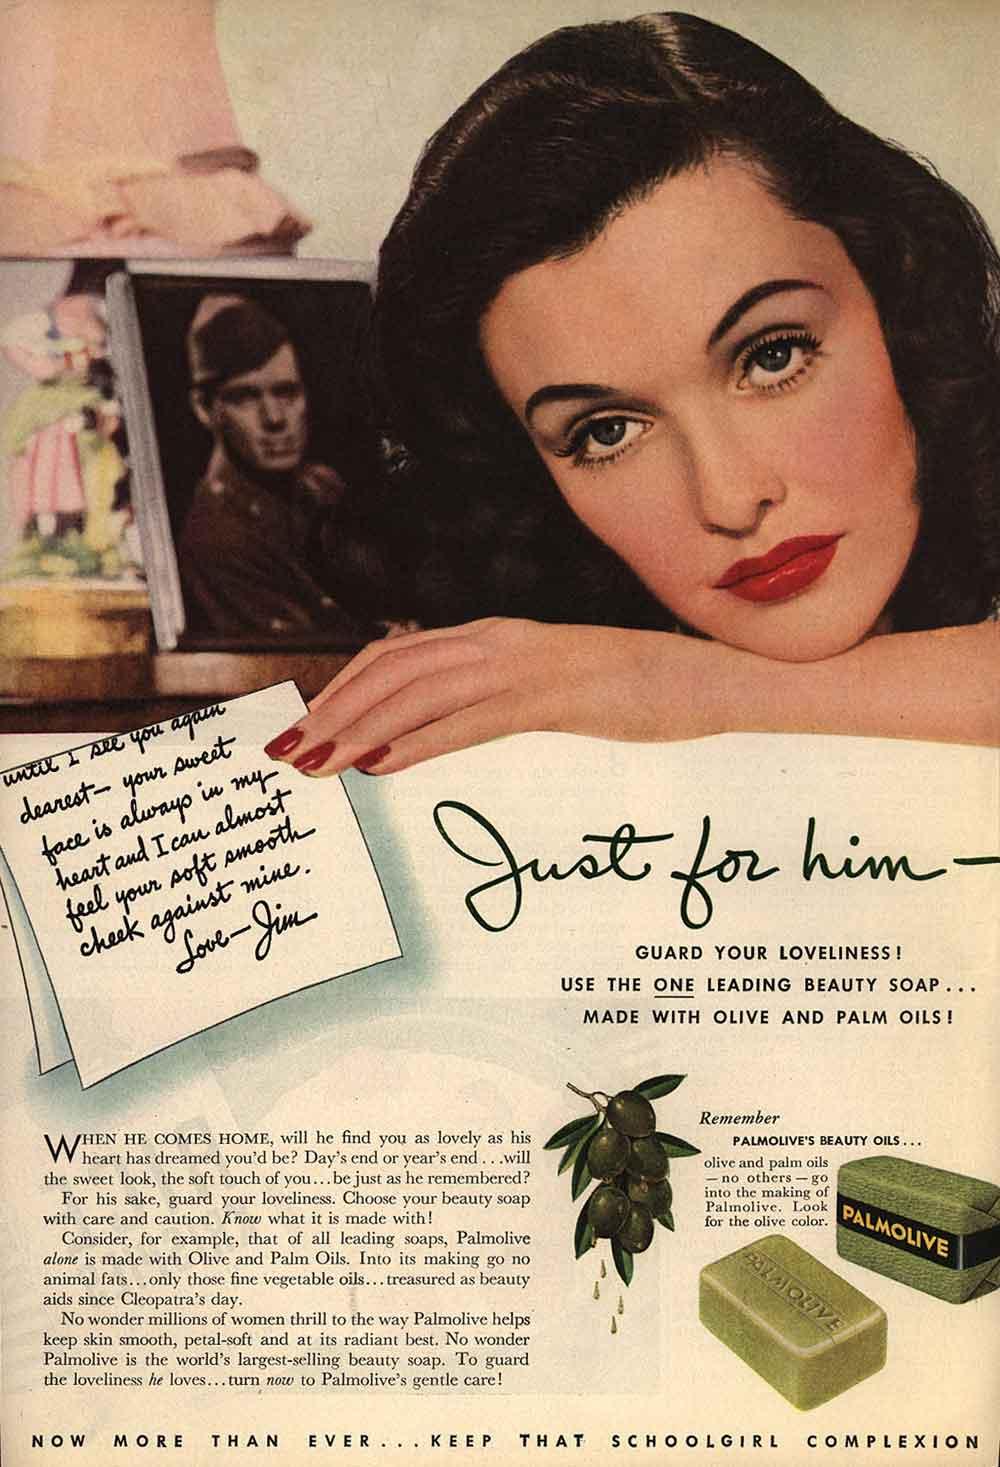 1940 – Five Steps to Winter Beauty